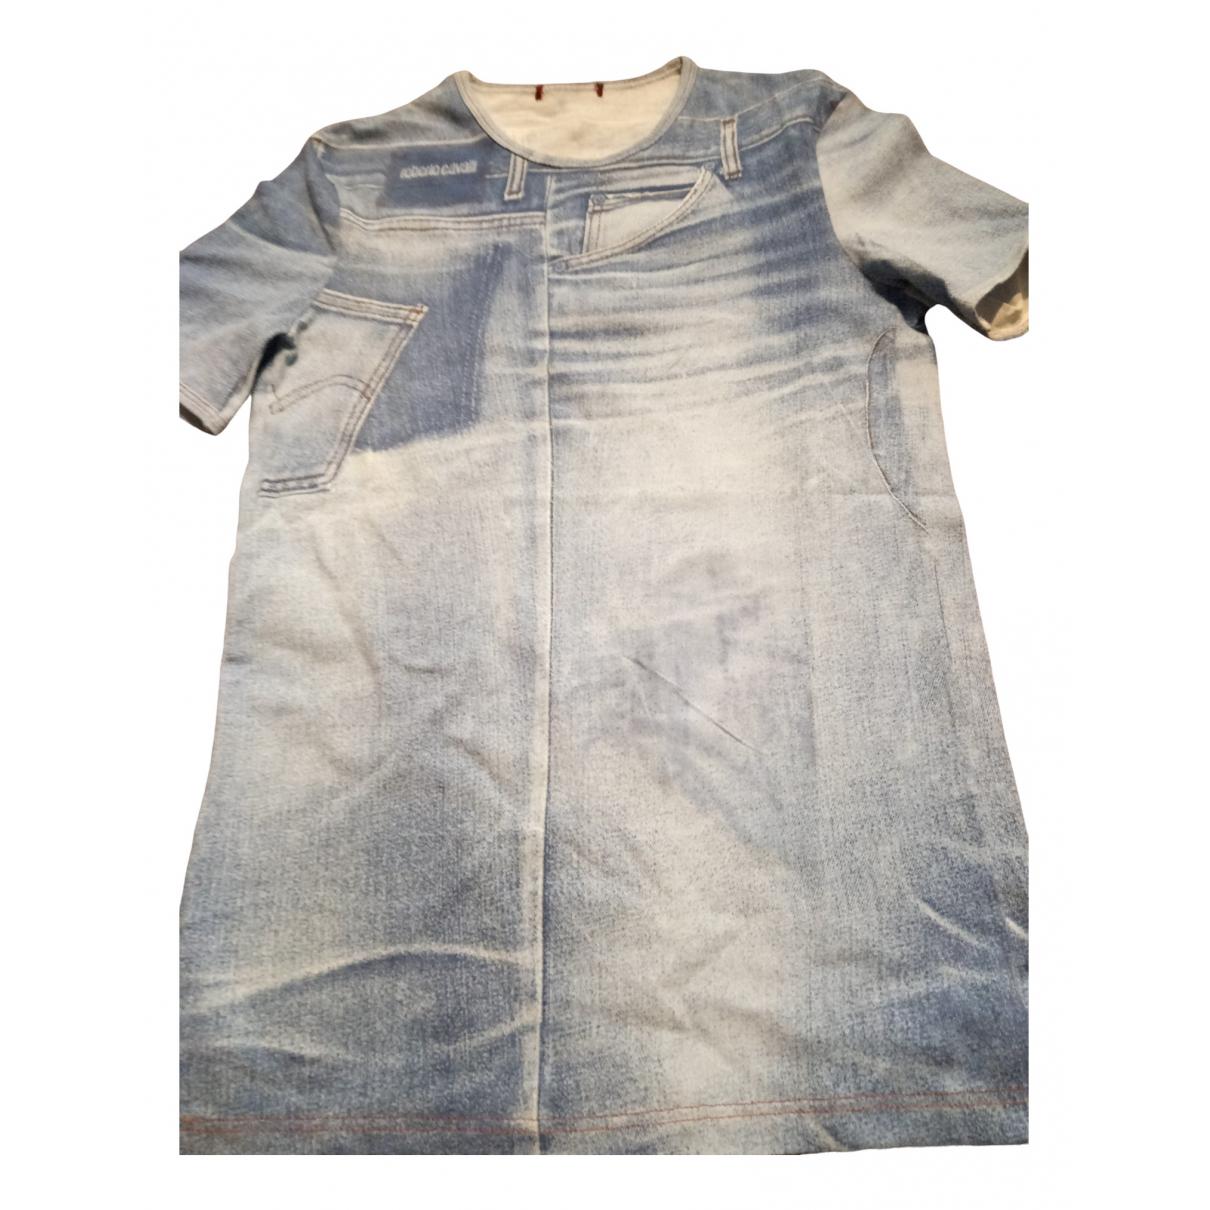 Roberto Cavalli \N Turquoise Cotton T-shirts for Men XS International